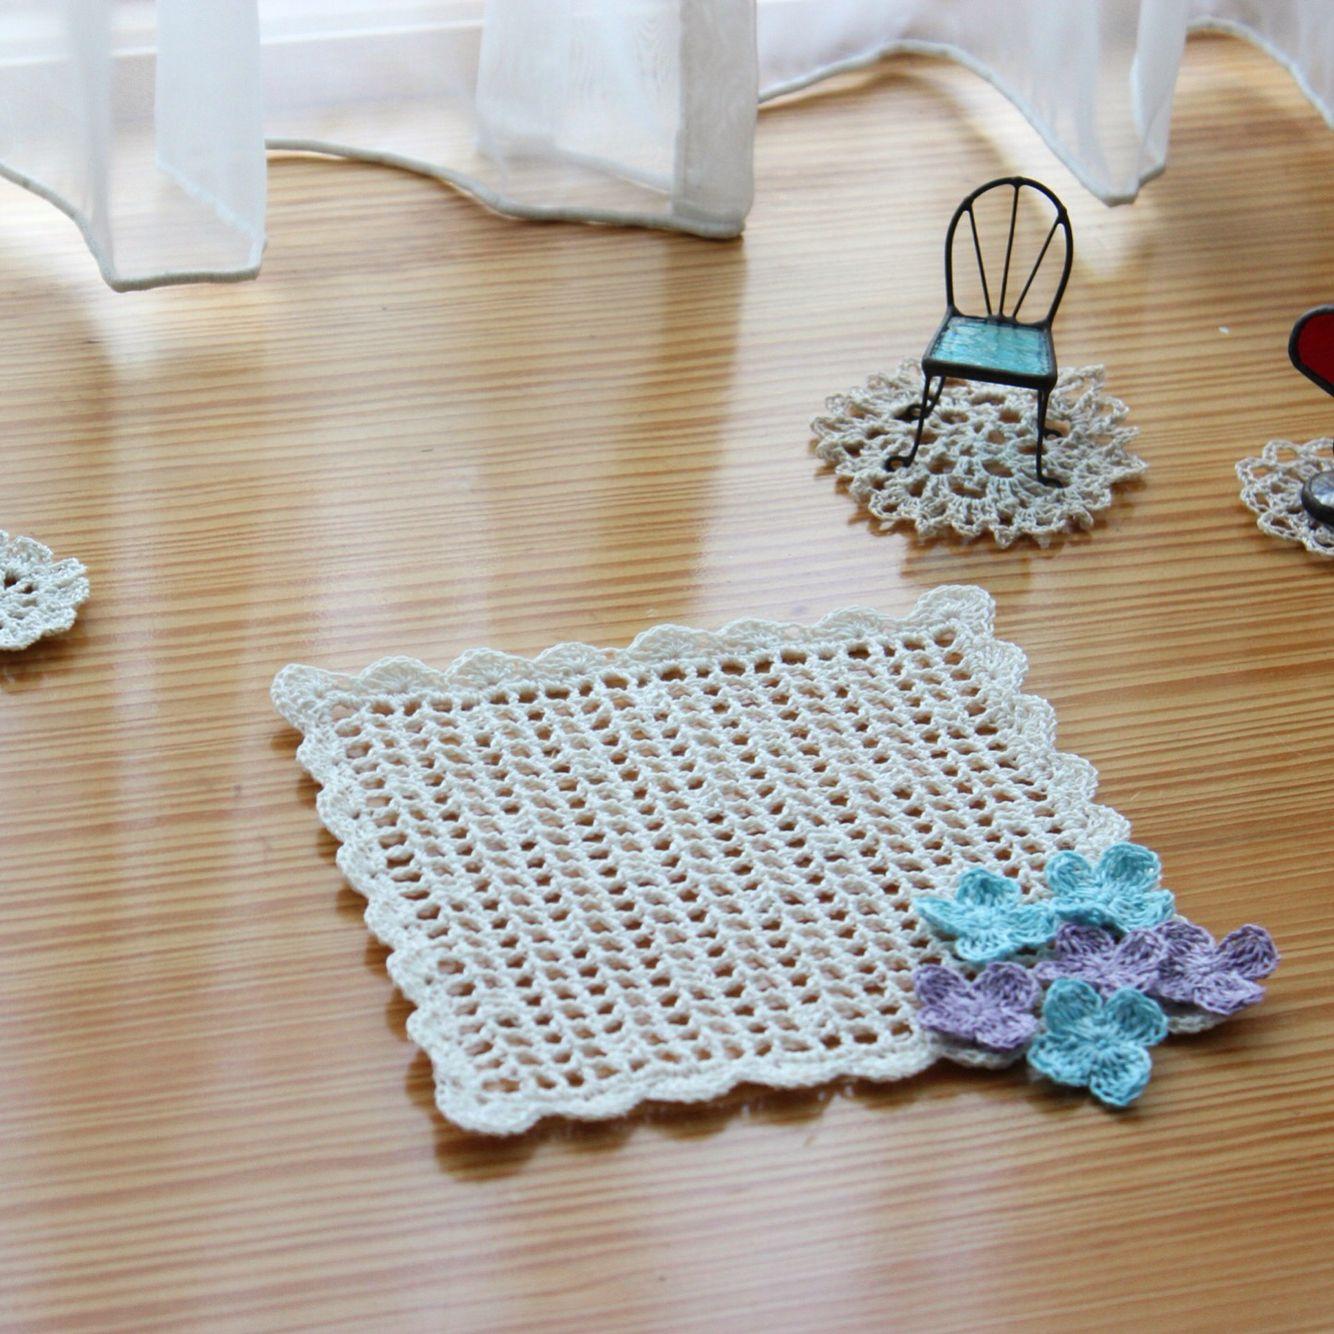 Pin de Eiko Oishi en かぎ針編み crochet | Pinterest